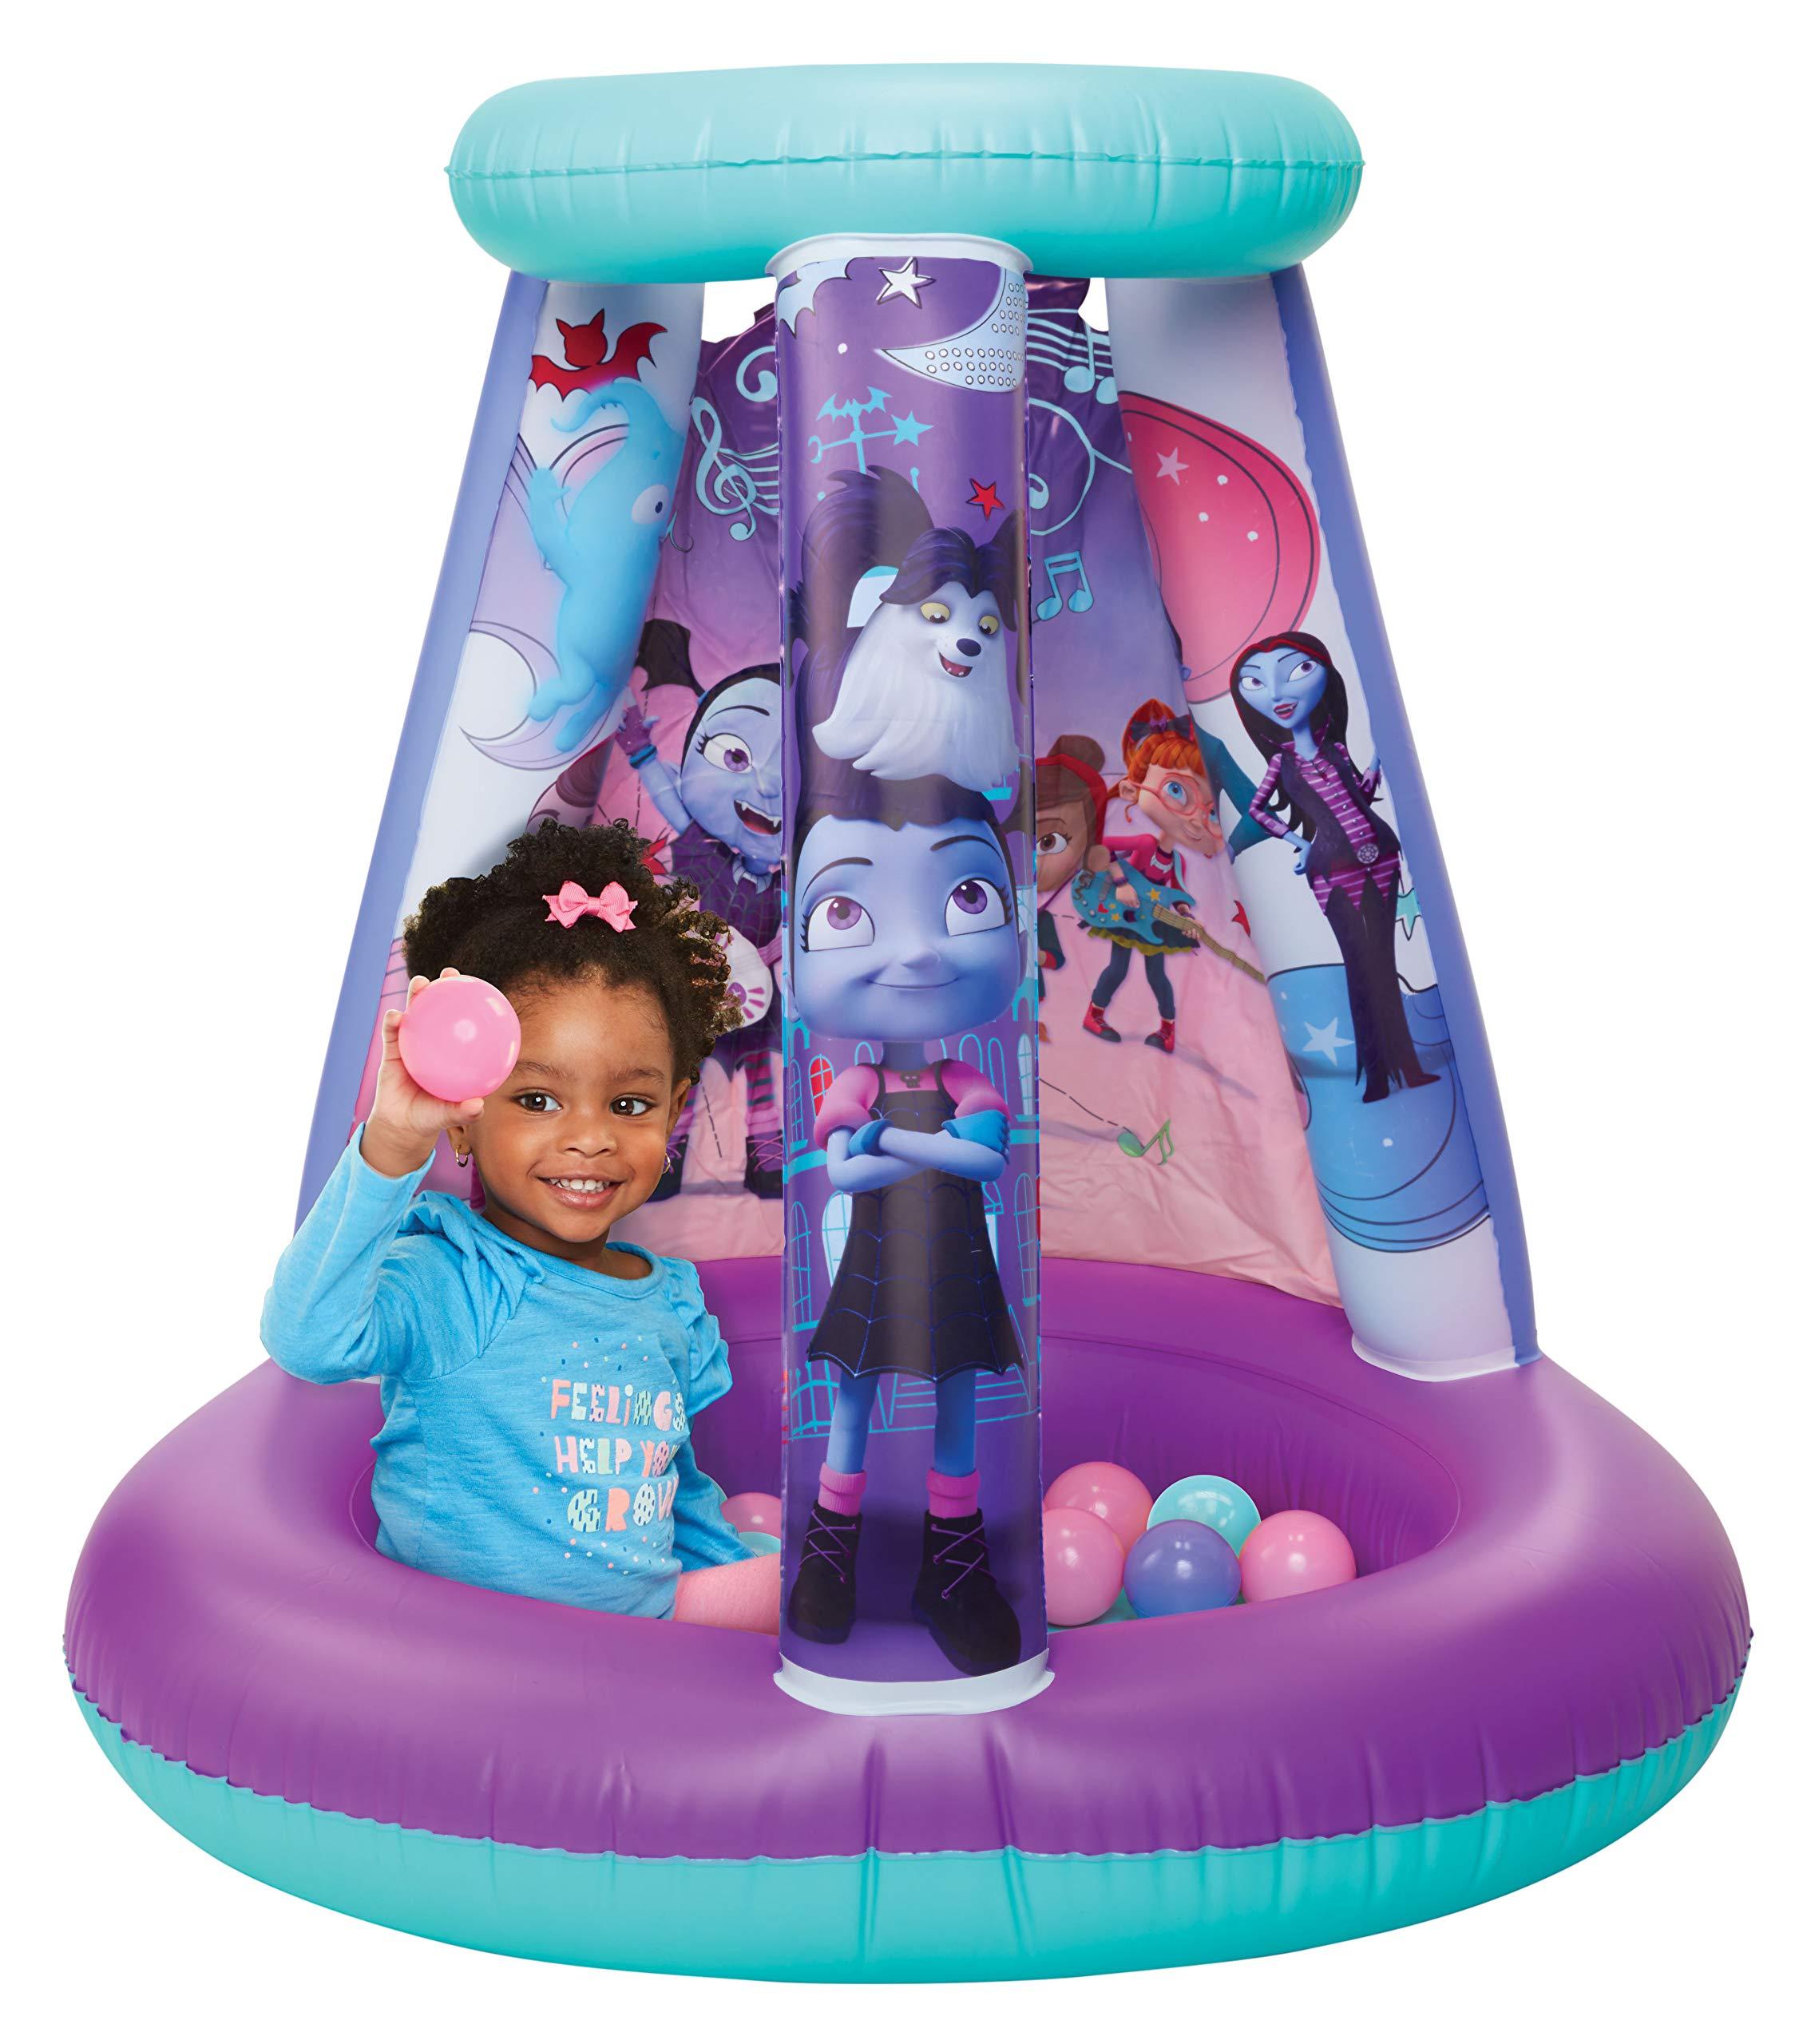 Vampirina Ball Pit, 1 Inflatable & 15 Sof-Flex Balls, Purple/Blue, 28''W x 28''D x 33''H